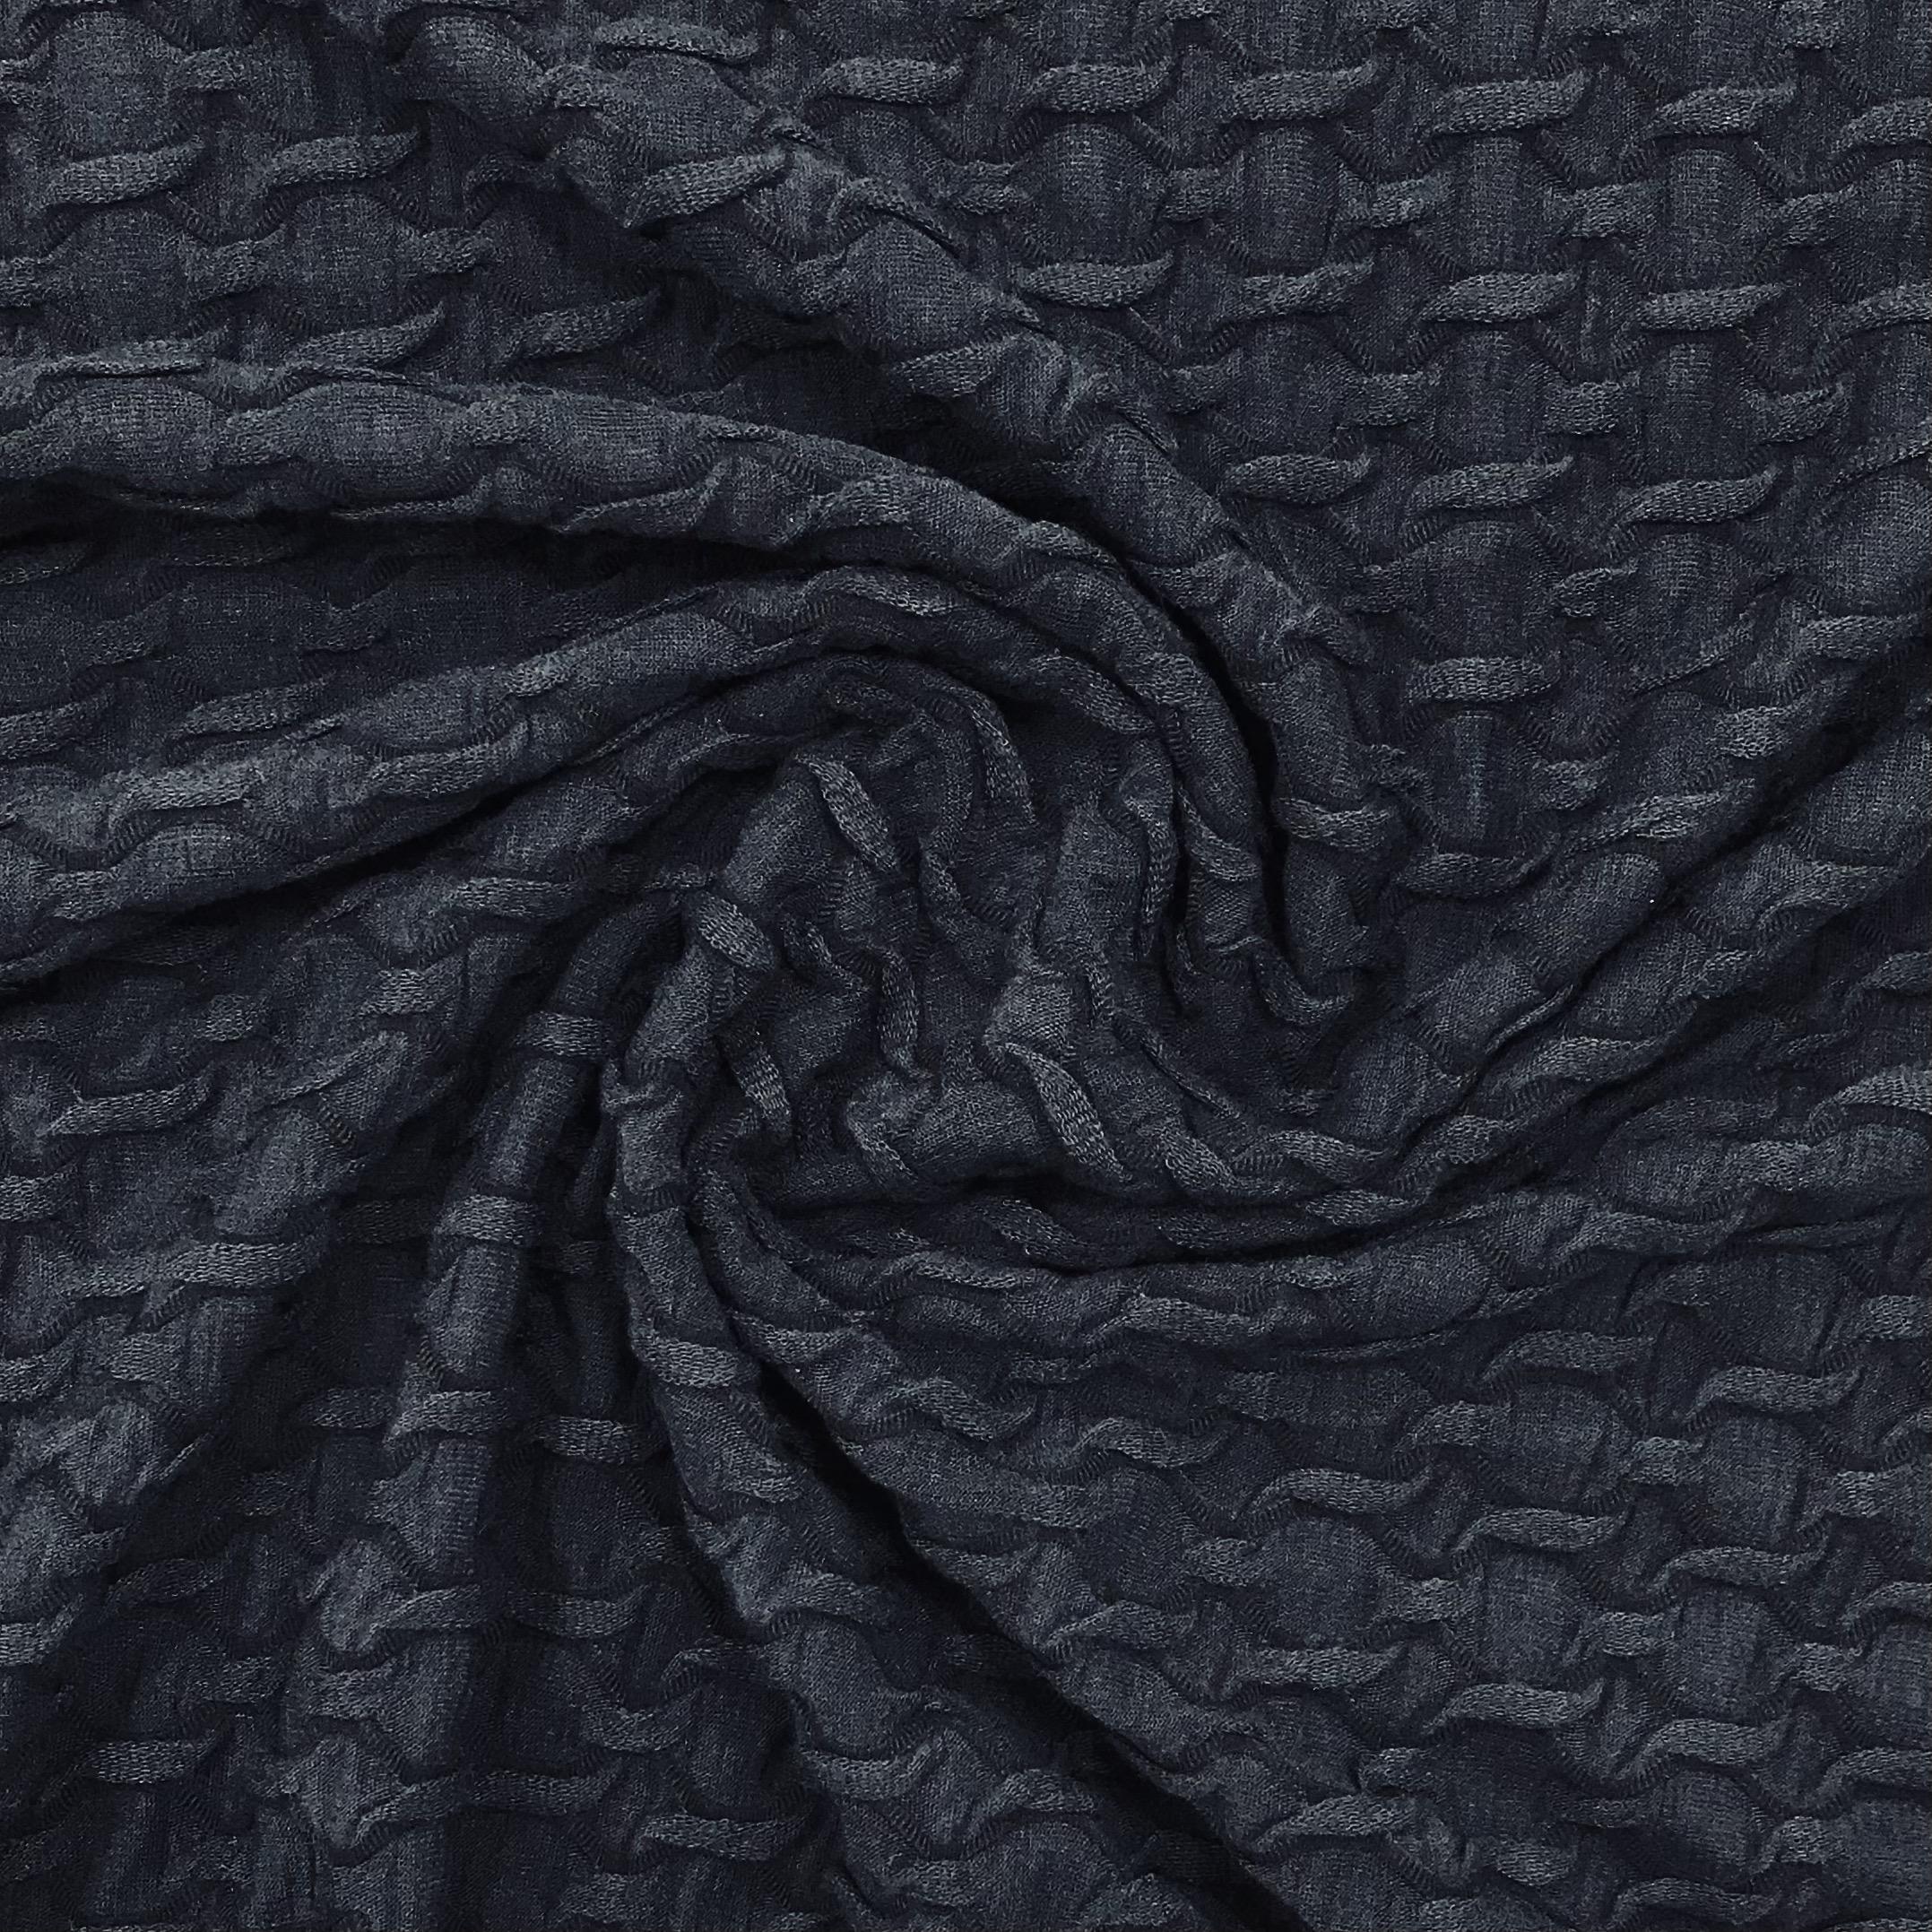 Jacquard High Low, dunkelblau. Art. Q11211-008